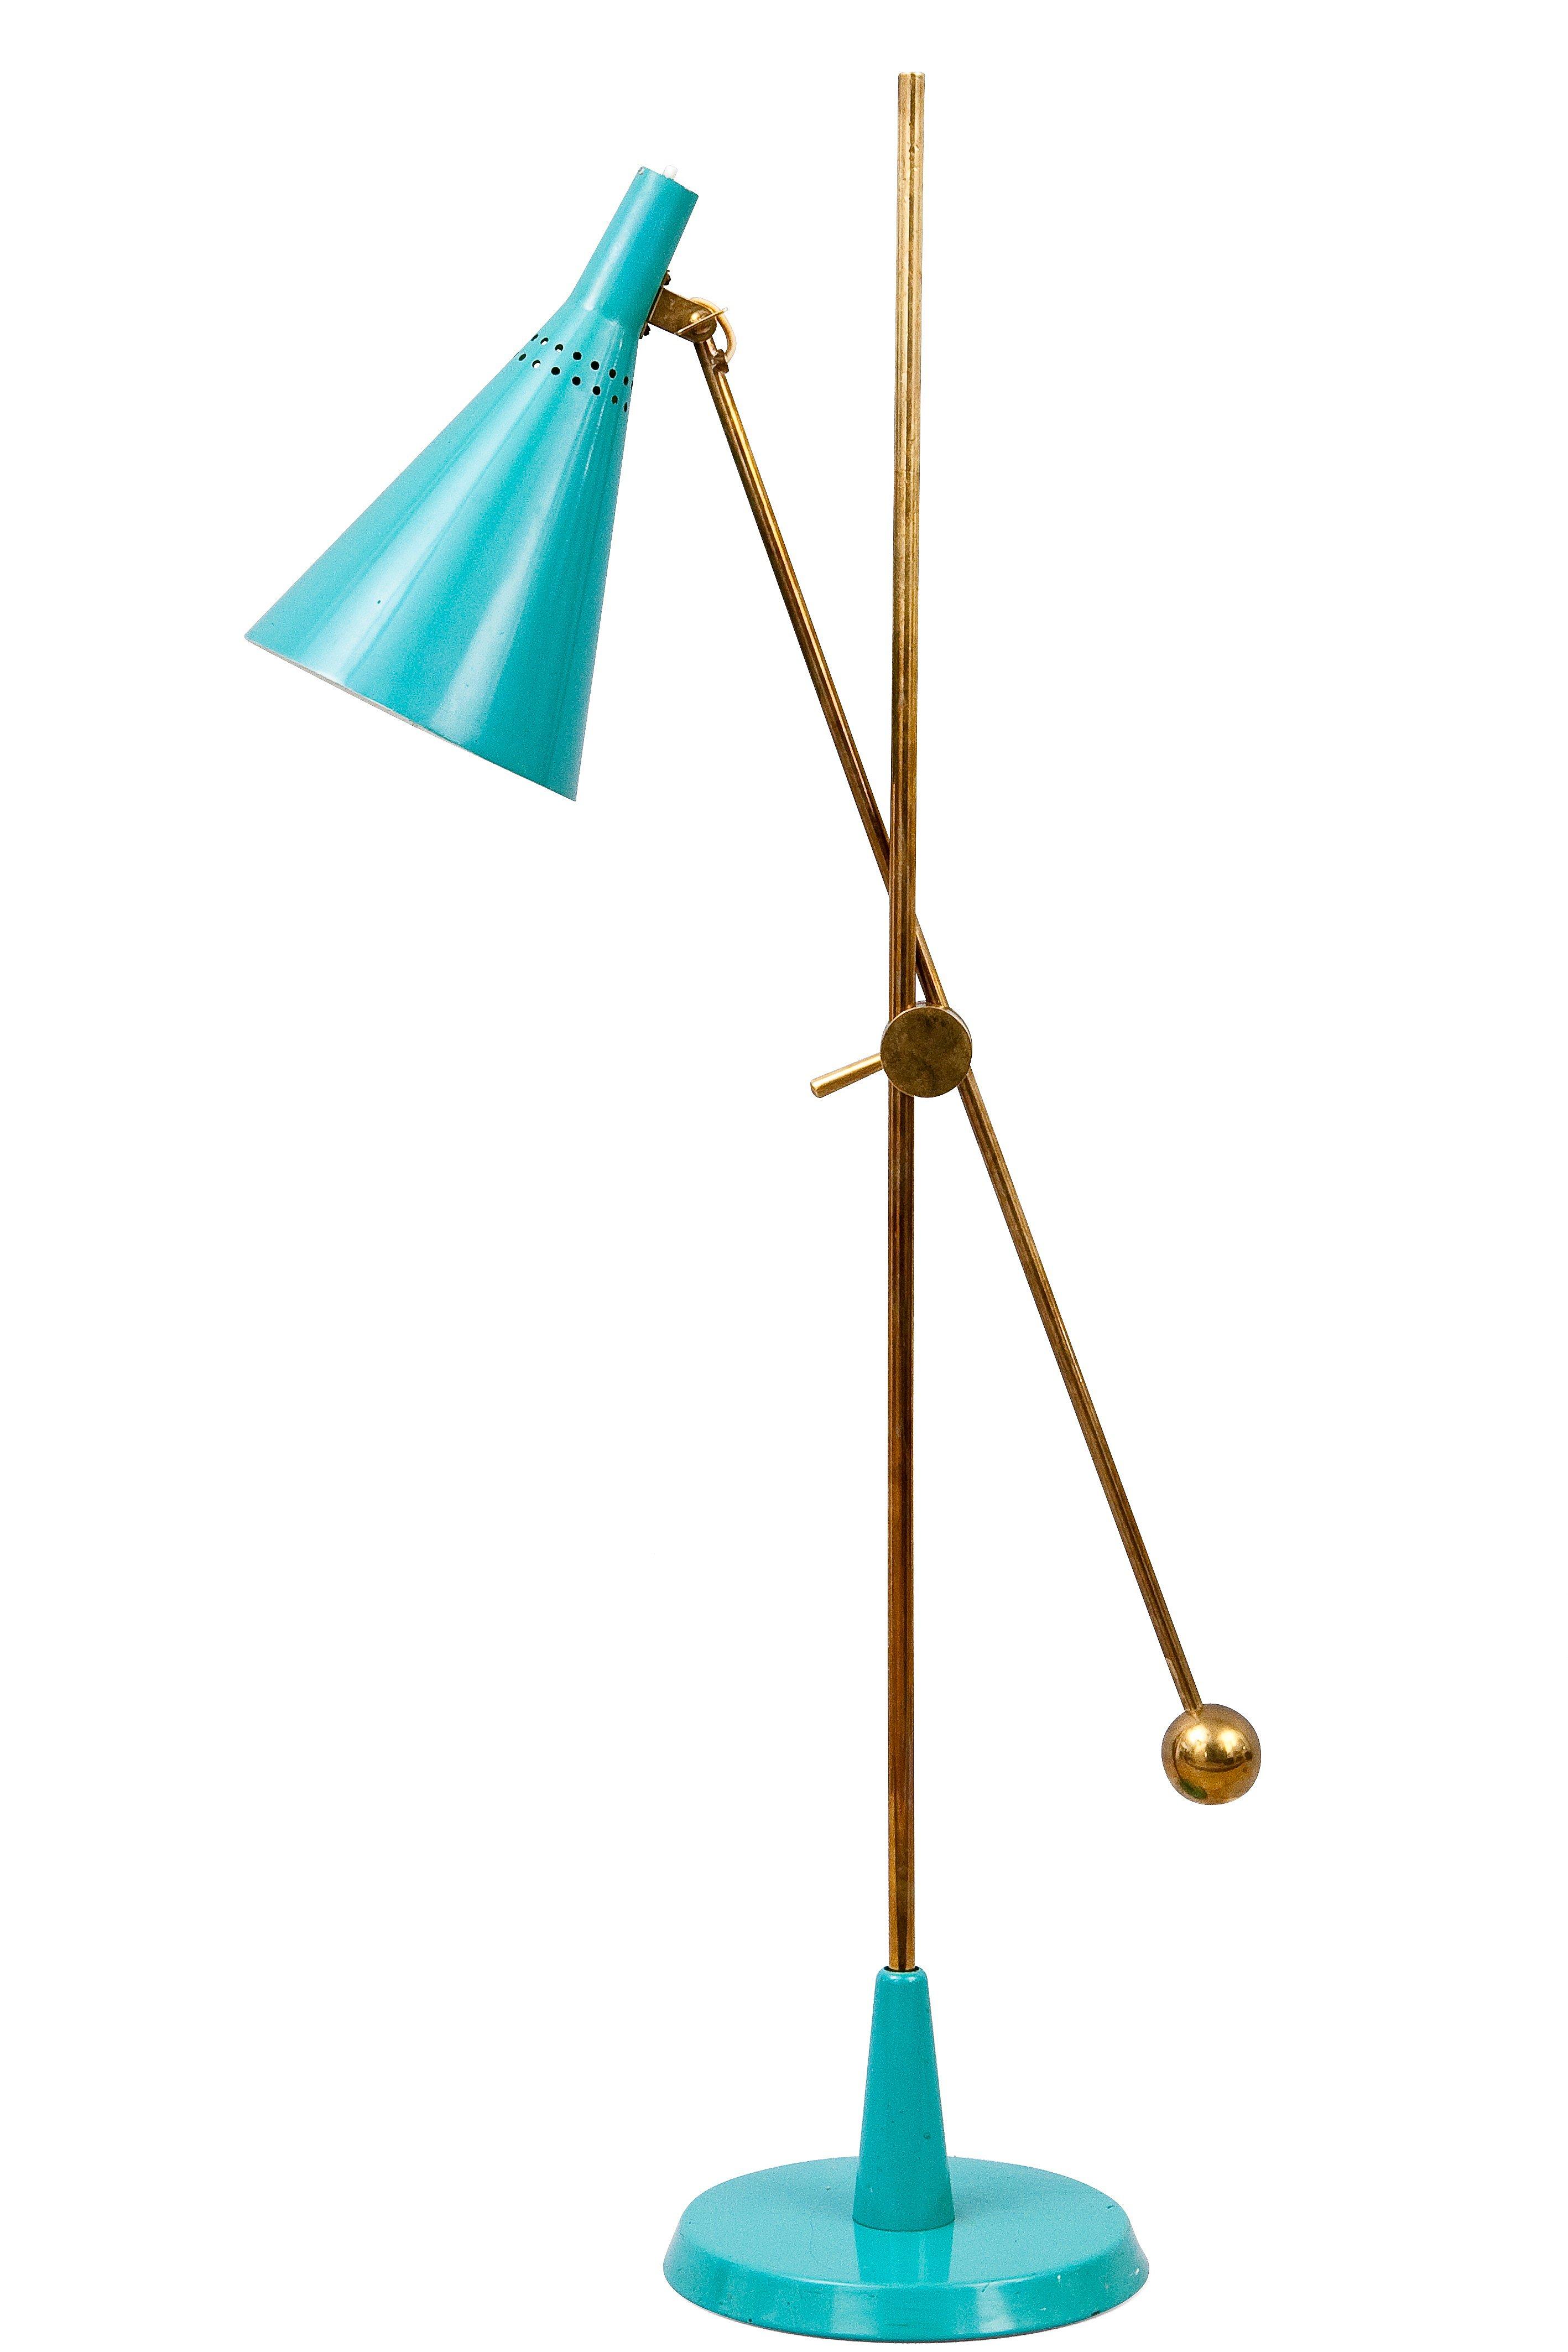 Cool Turquoise Floor Lamp | HomesFeed:Adjustable Direction Of Turquoise Floor Lamp,Lighting